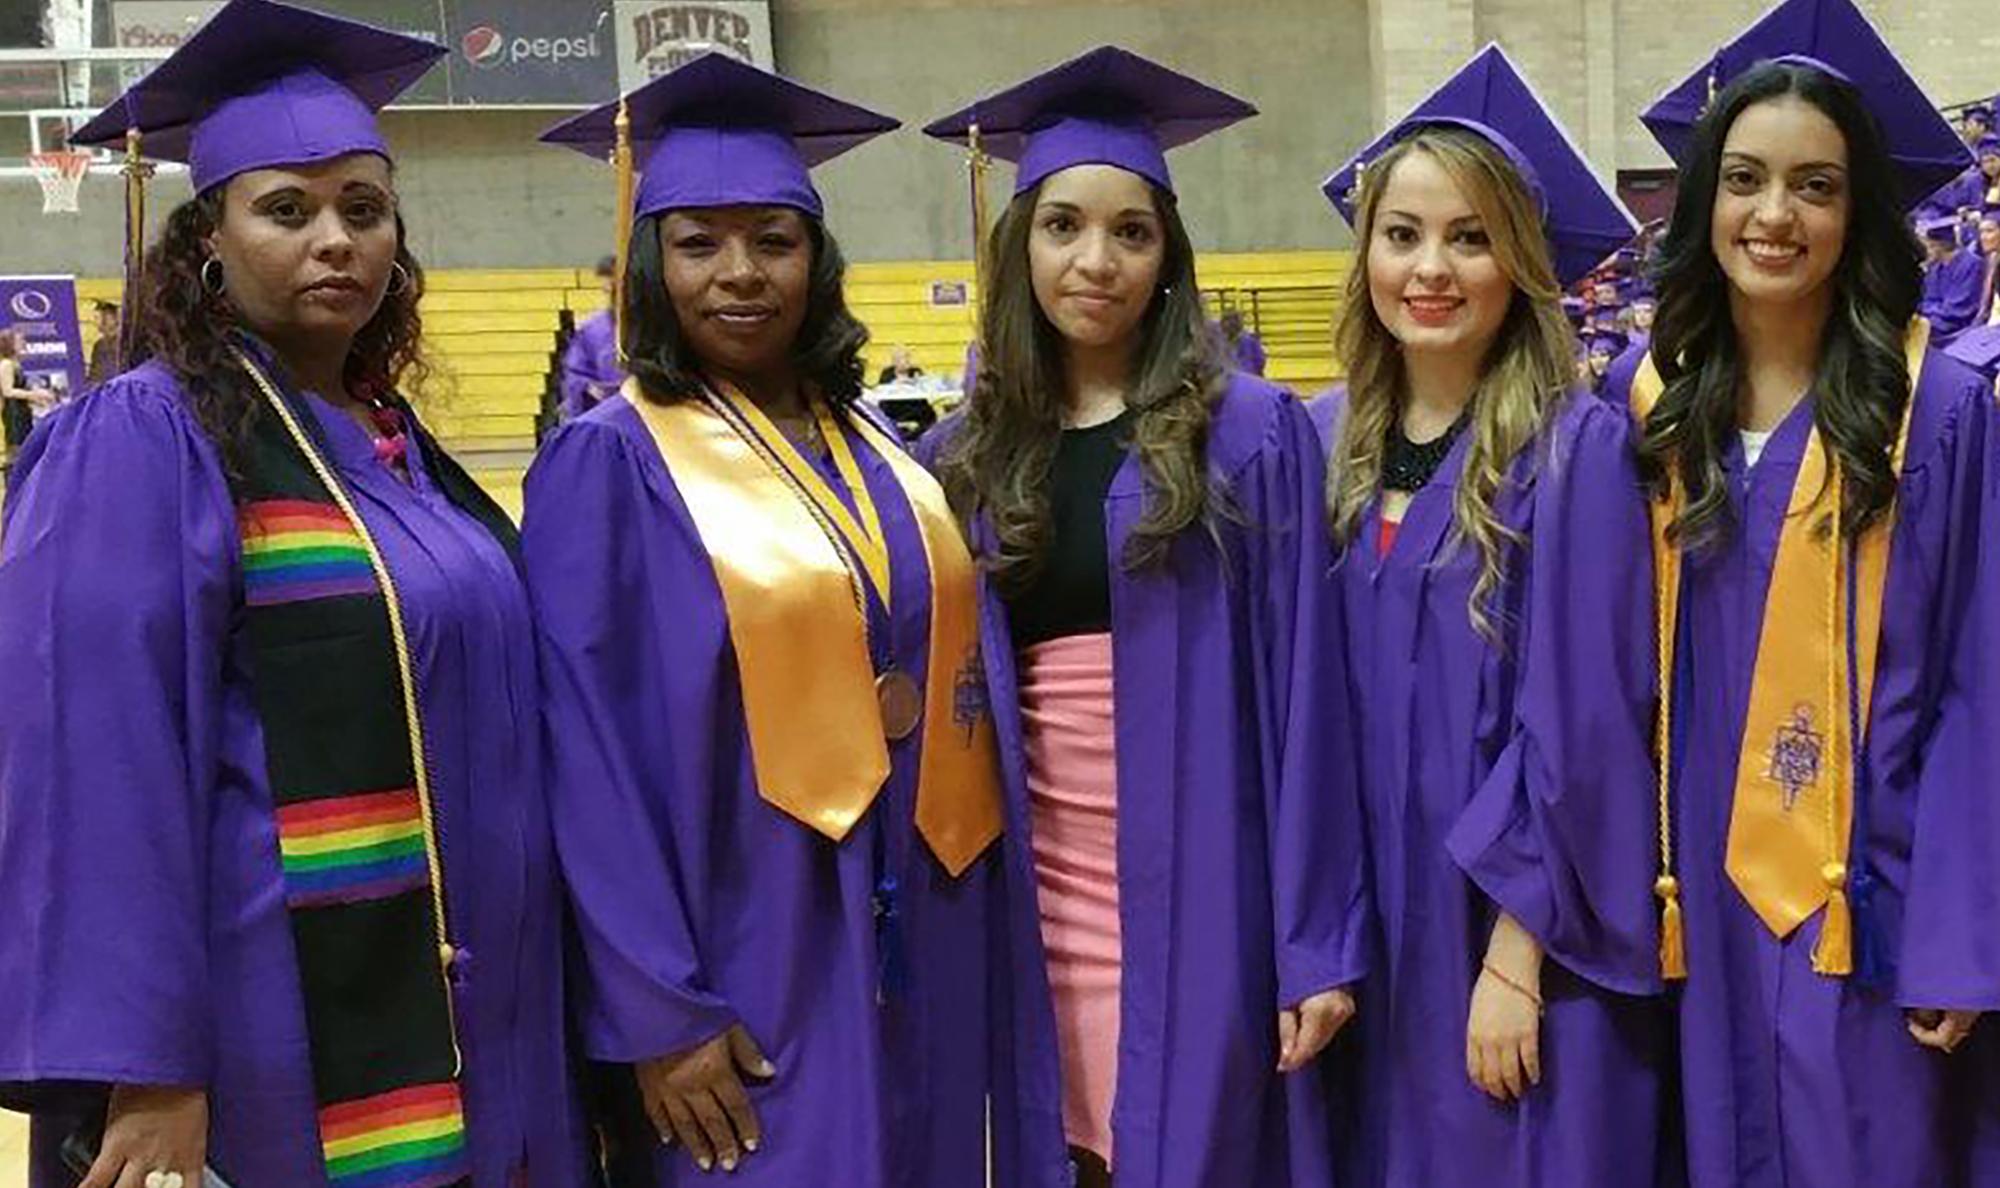 five women in purple cap and gown graduation regalia